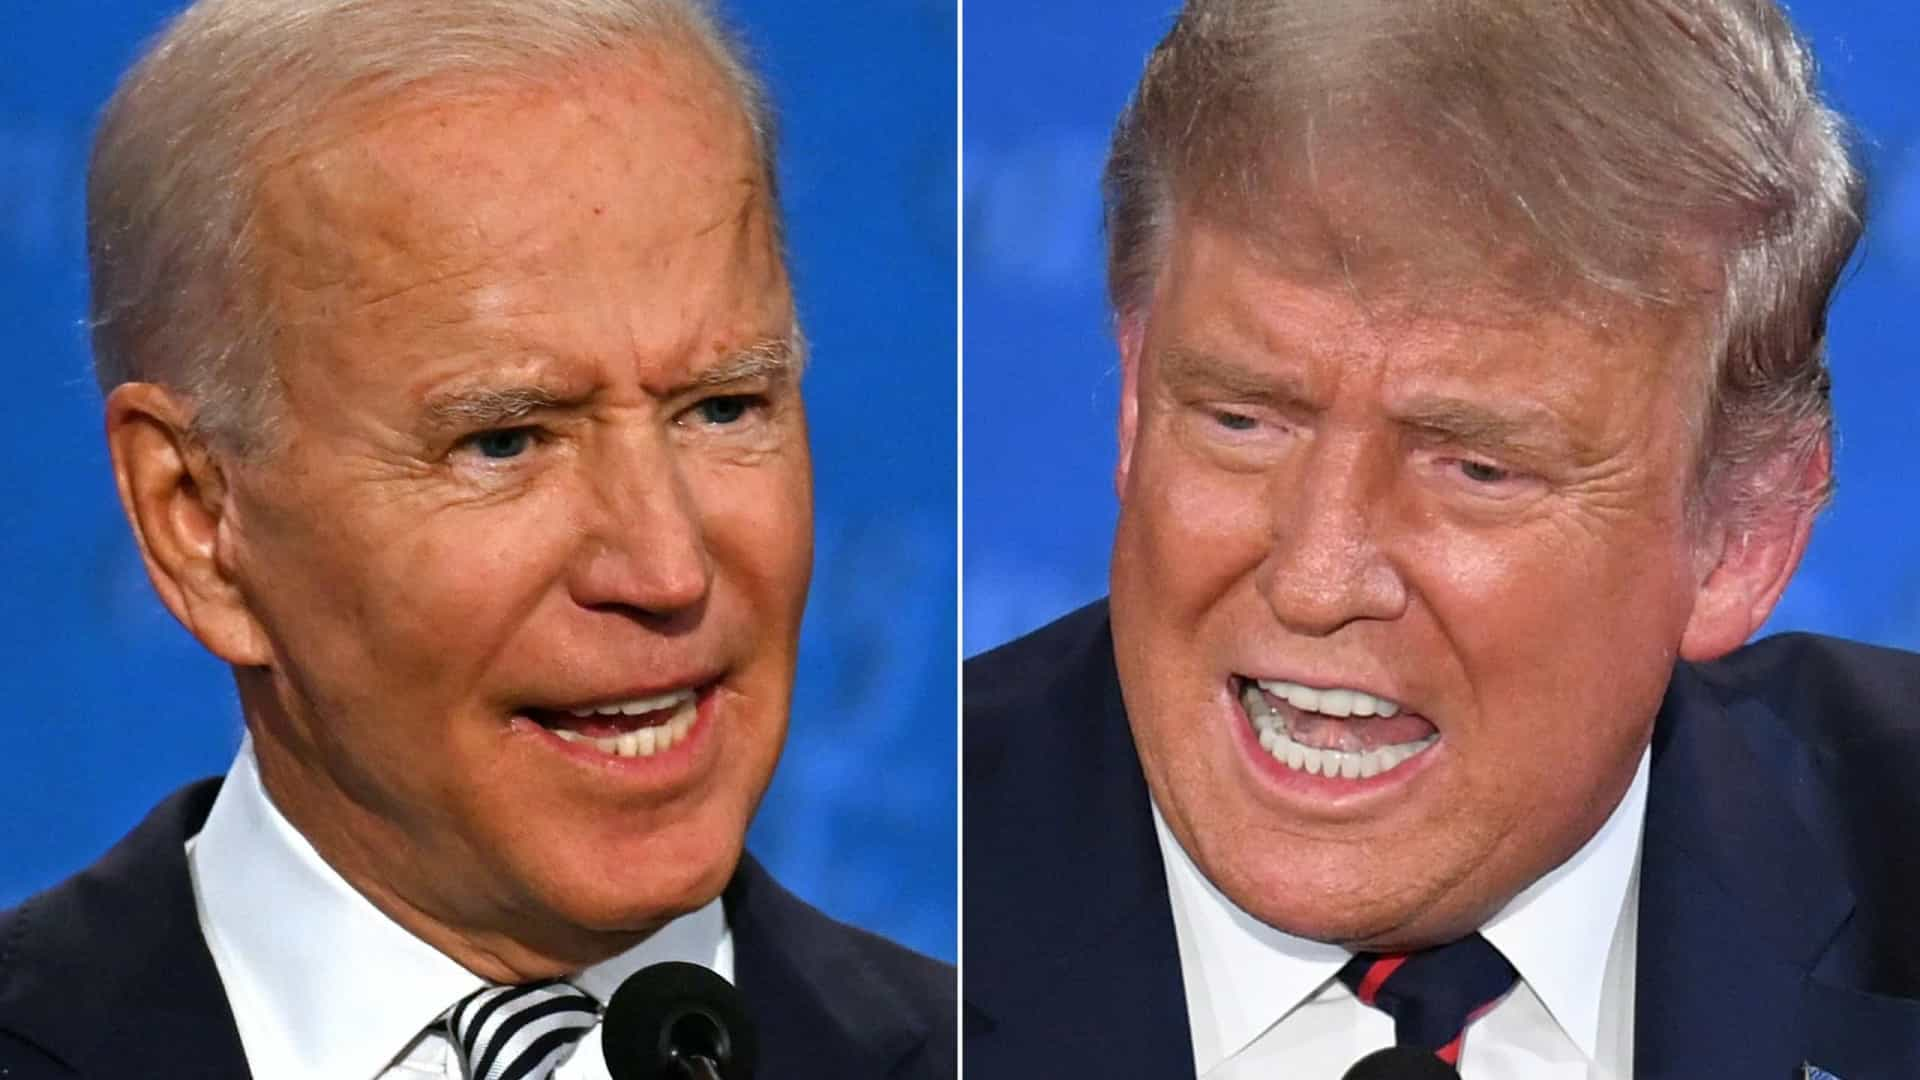 Com Biden prestes a confirmar vitória, Trump age para levar disputa à Justiça